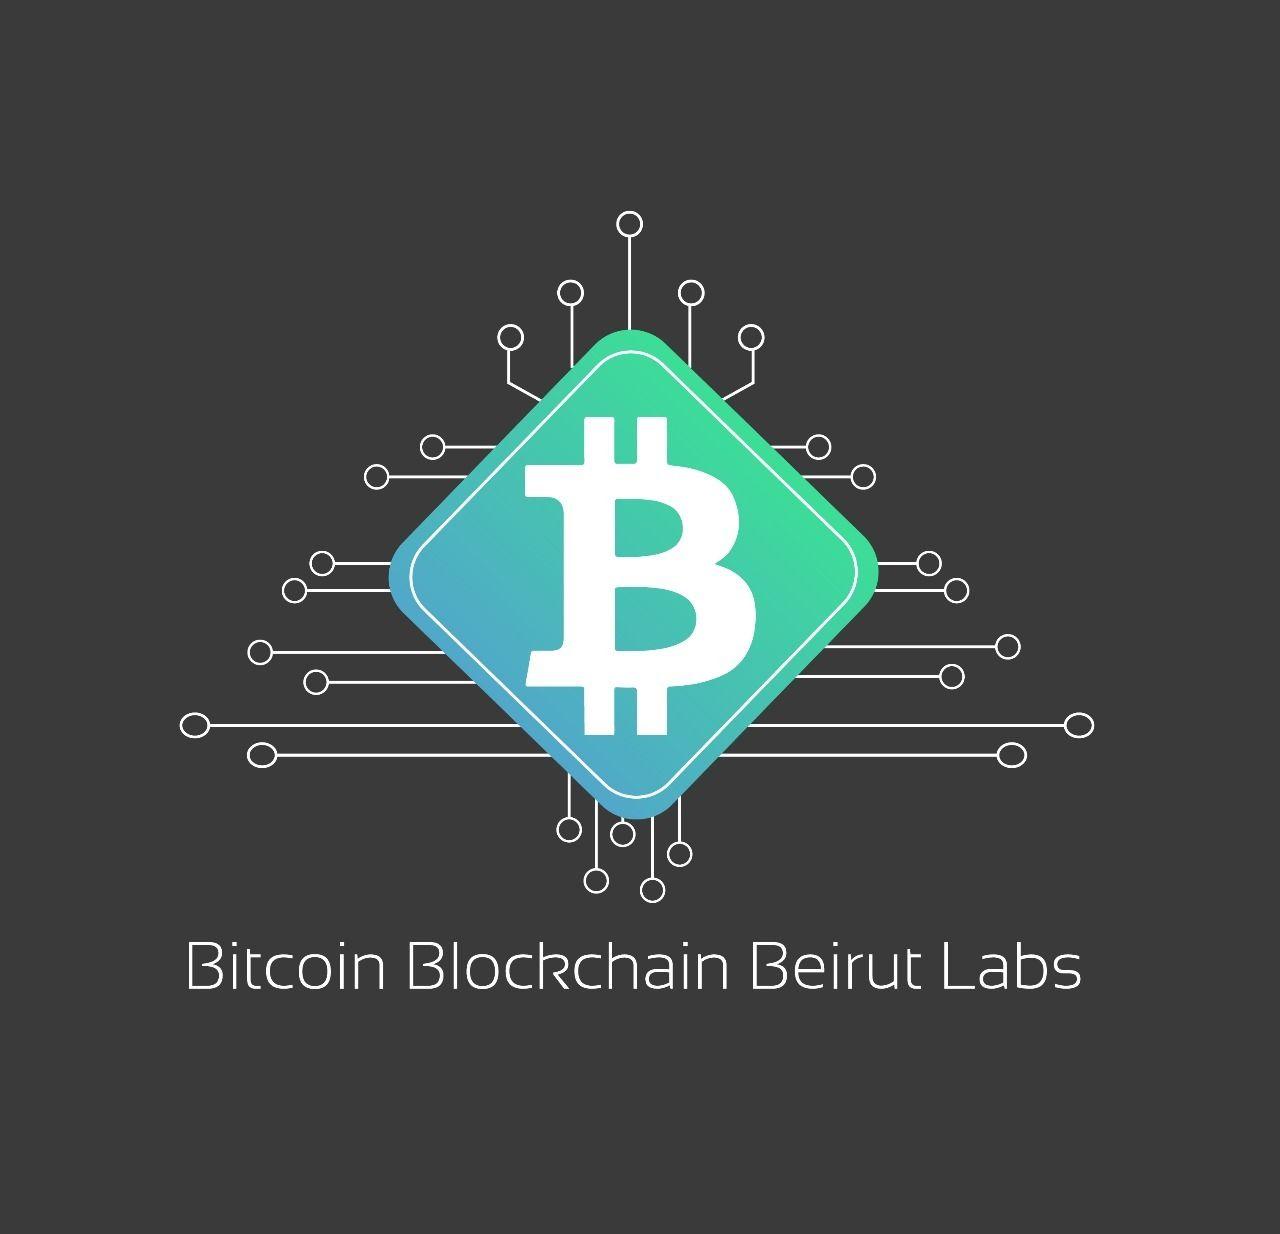 Bitcoin & Blockchain Beirut Labs